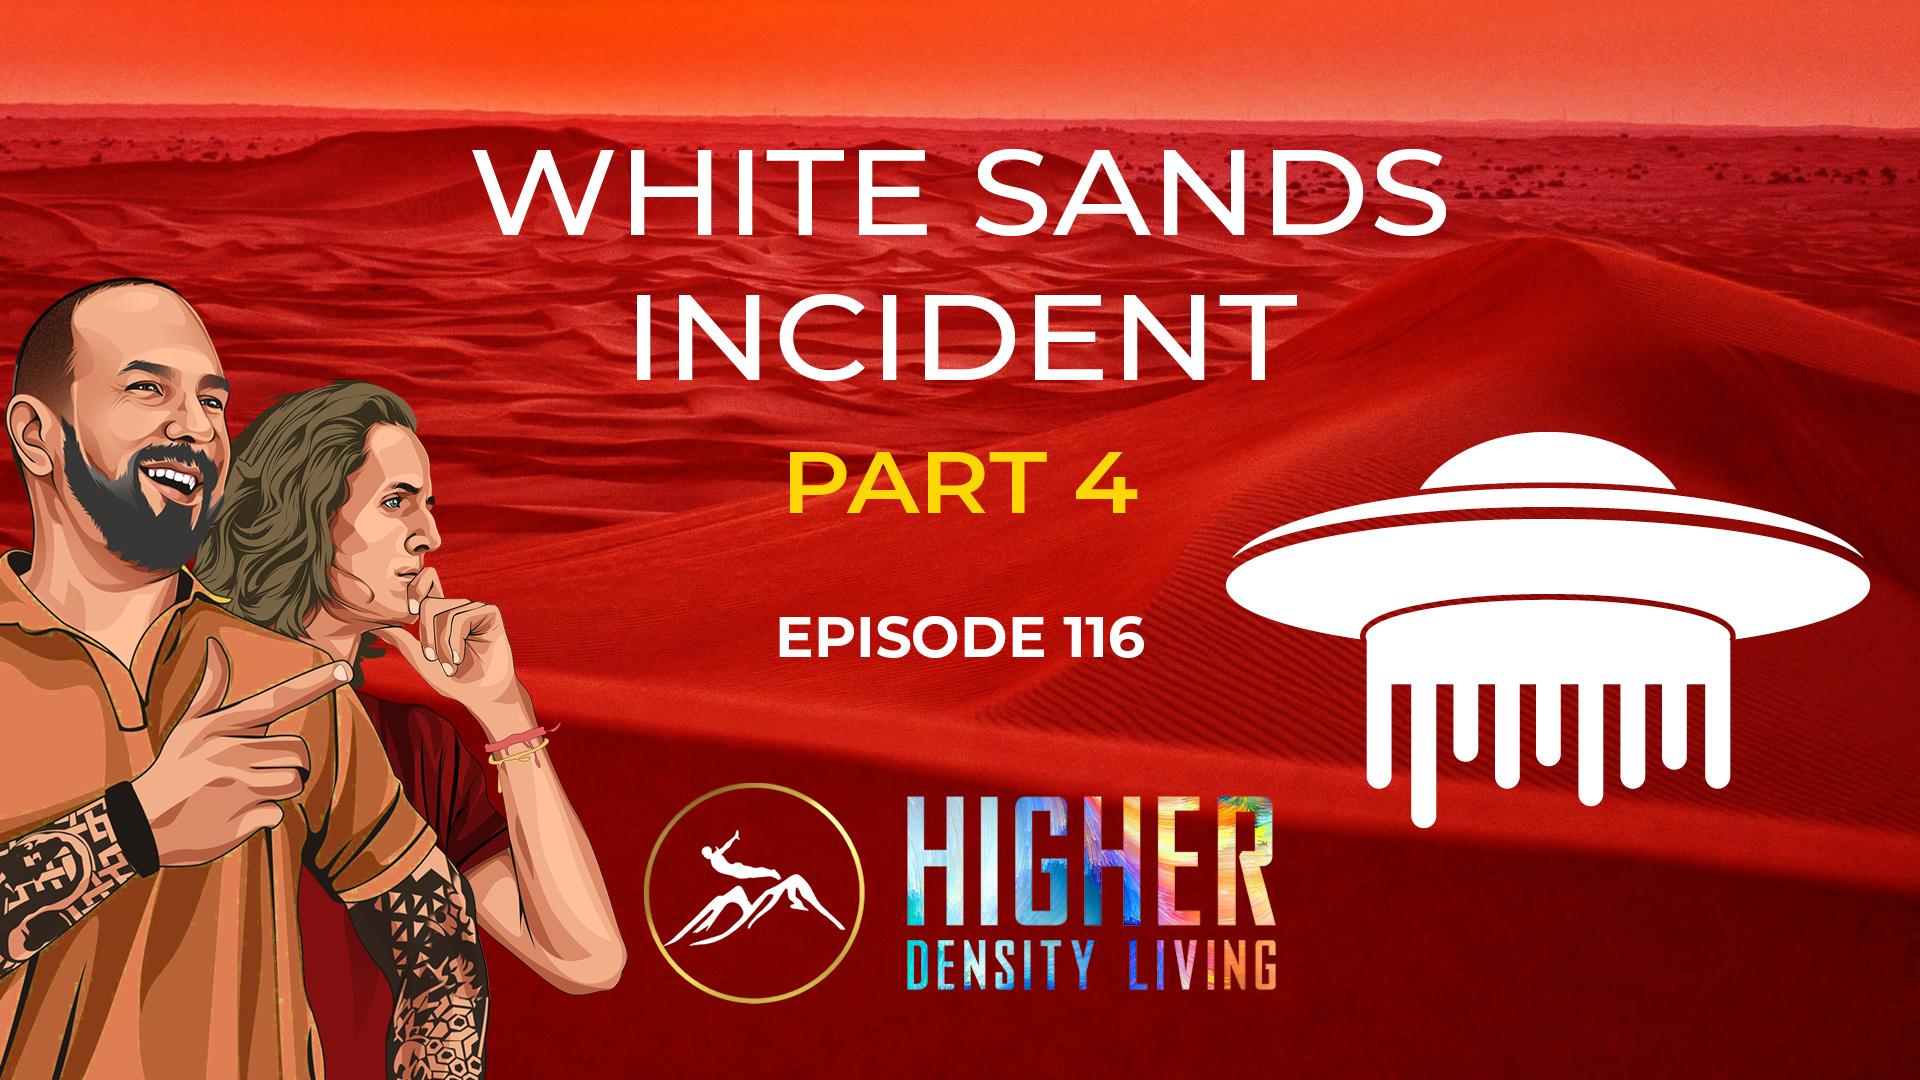 White Sands Incident - Part 4